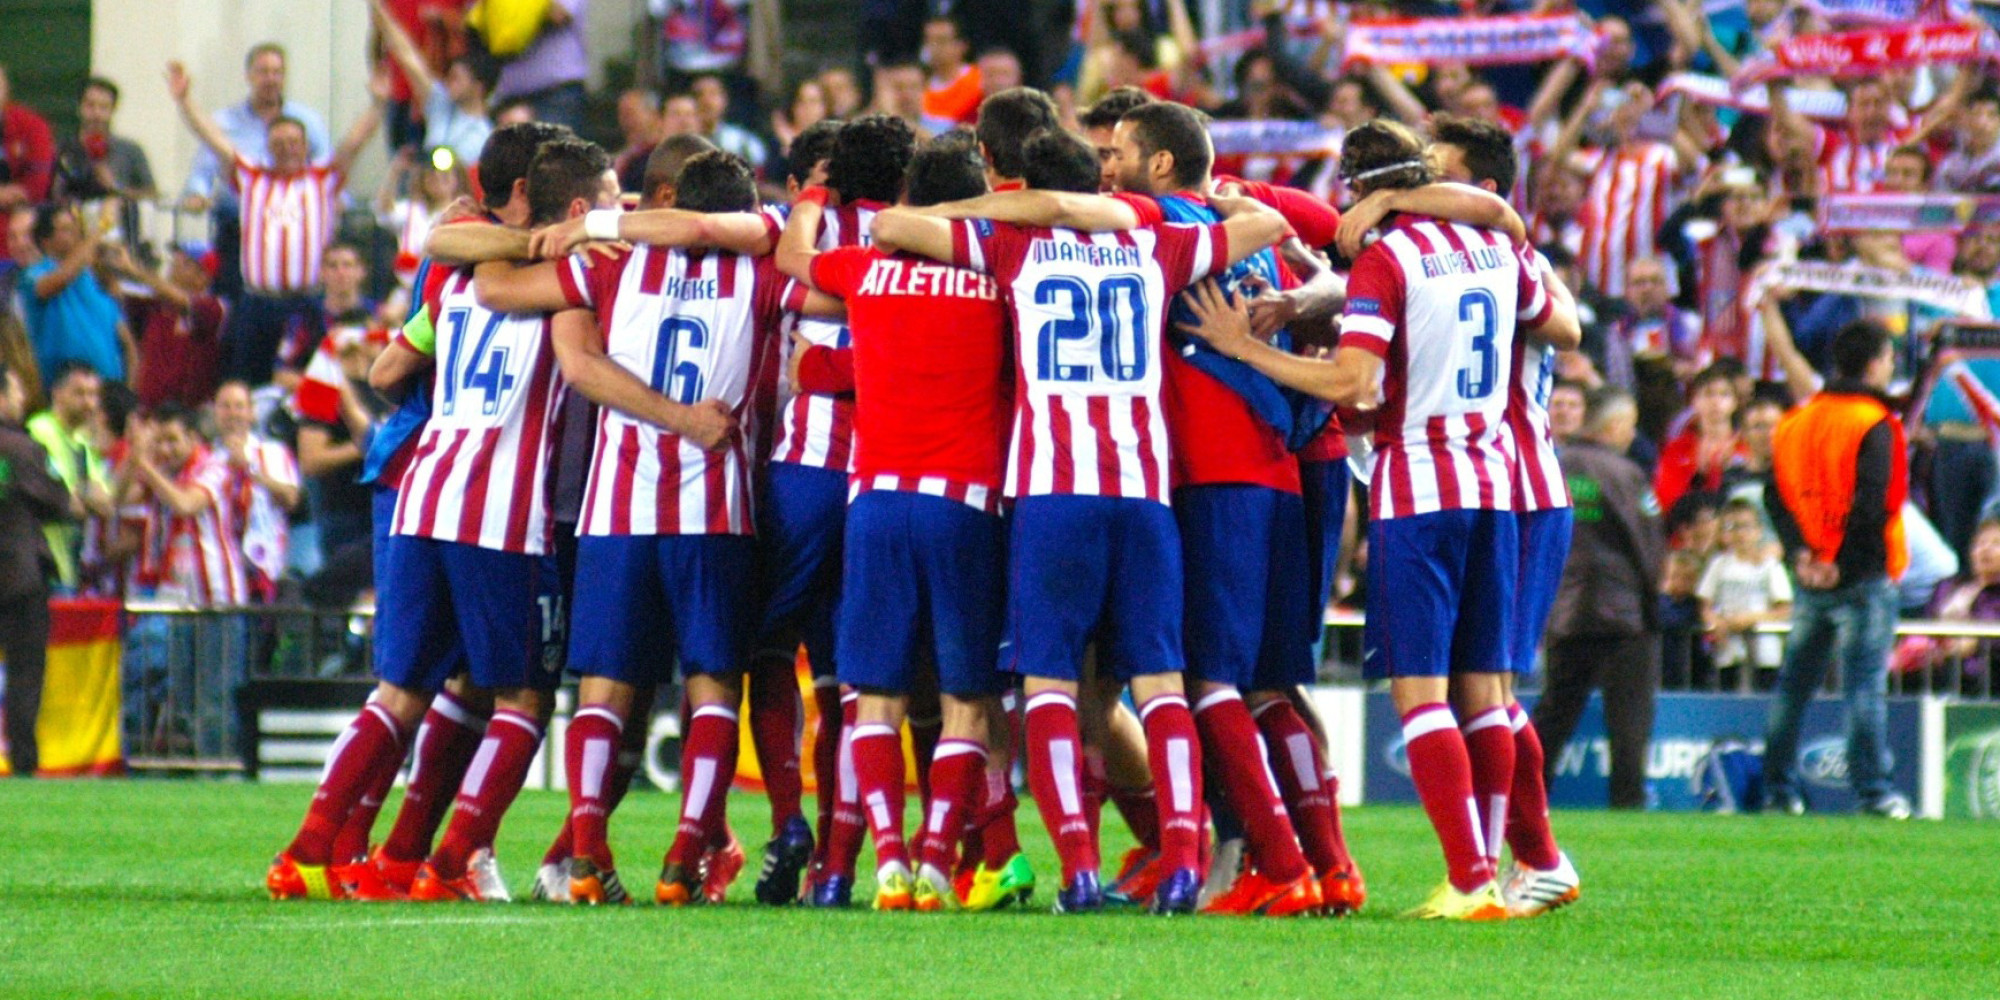 atletico madrid - photo #18